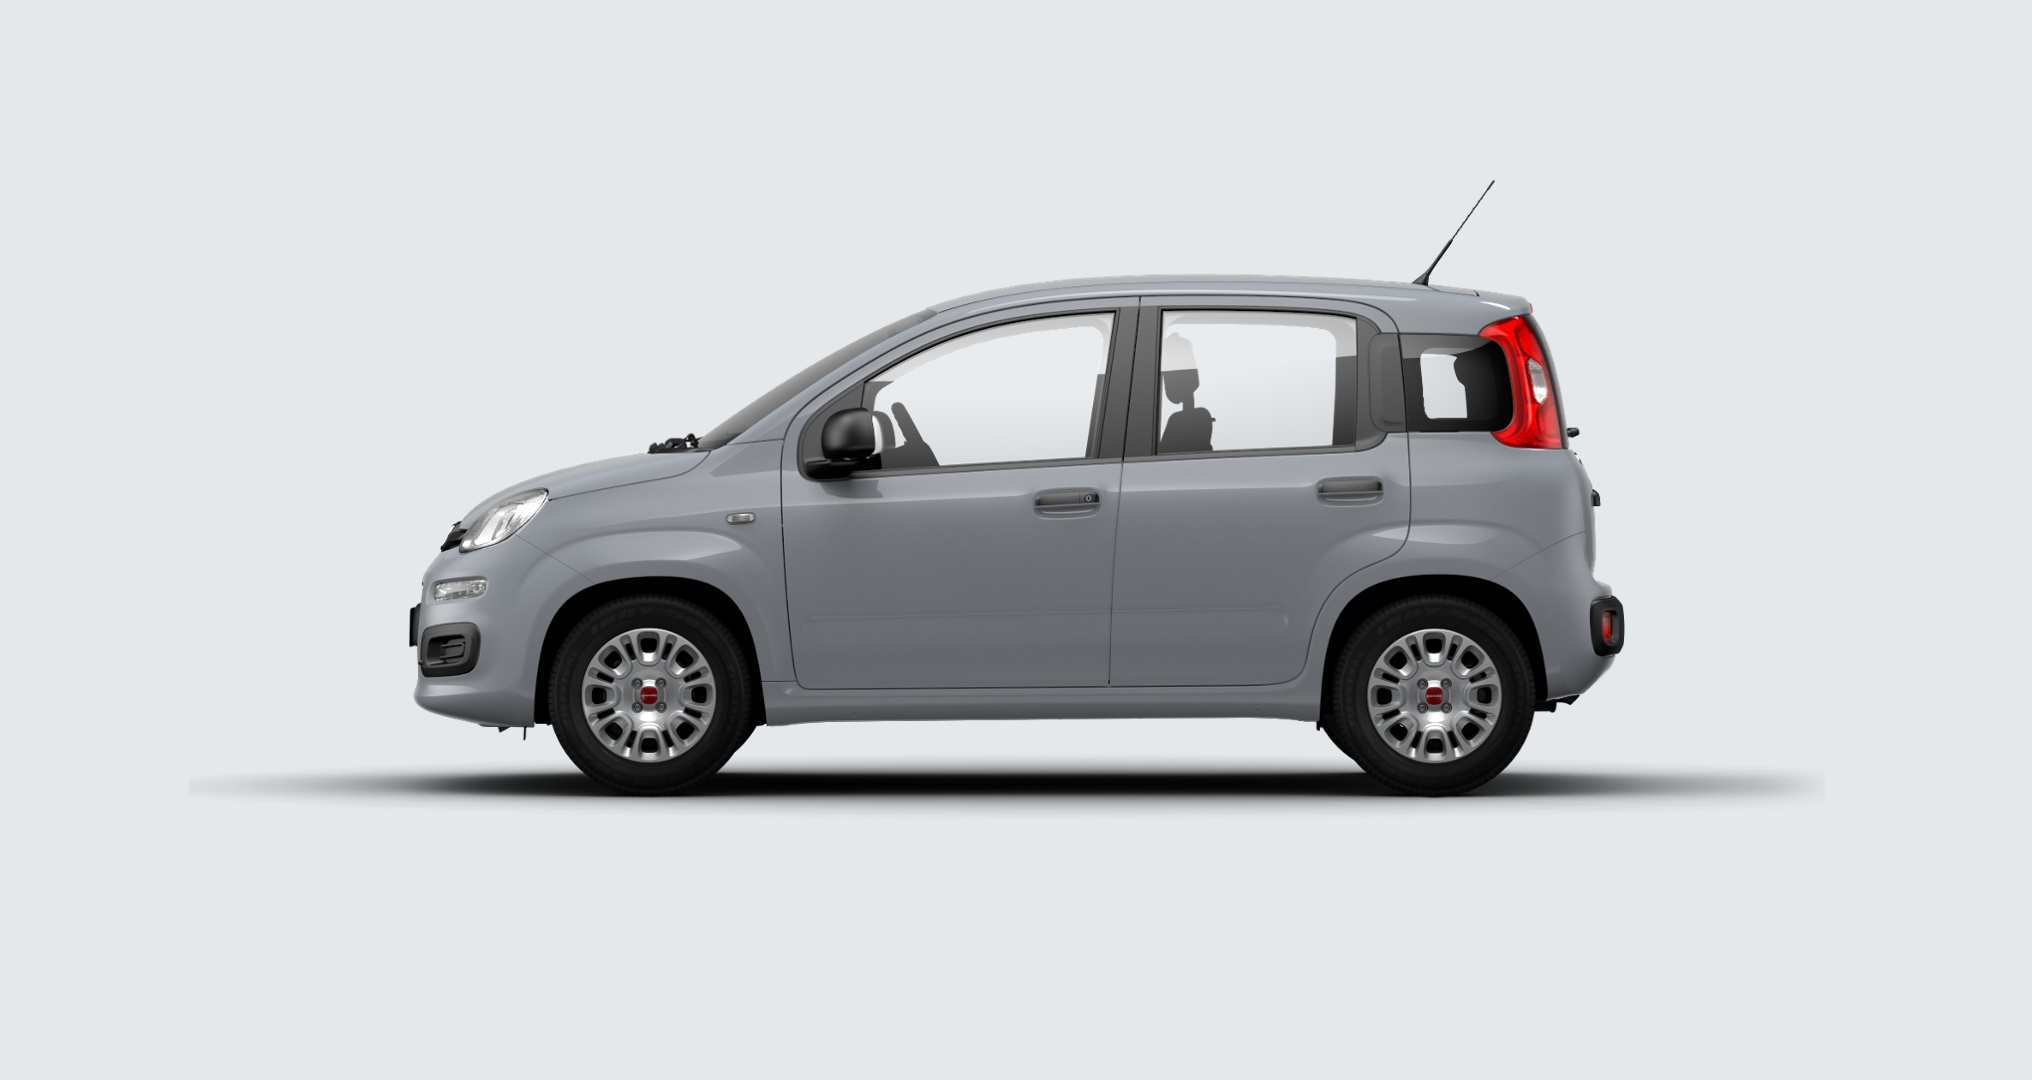 FIAT Panda 1.2 Easy Grigio Moda Km 0 P3U0U3P-c